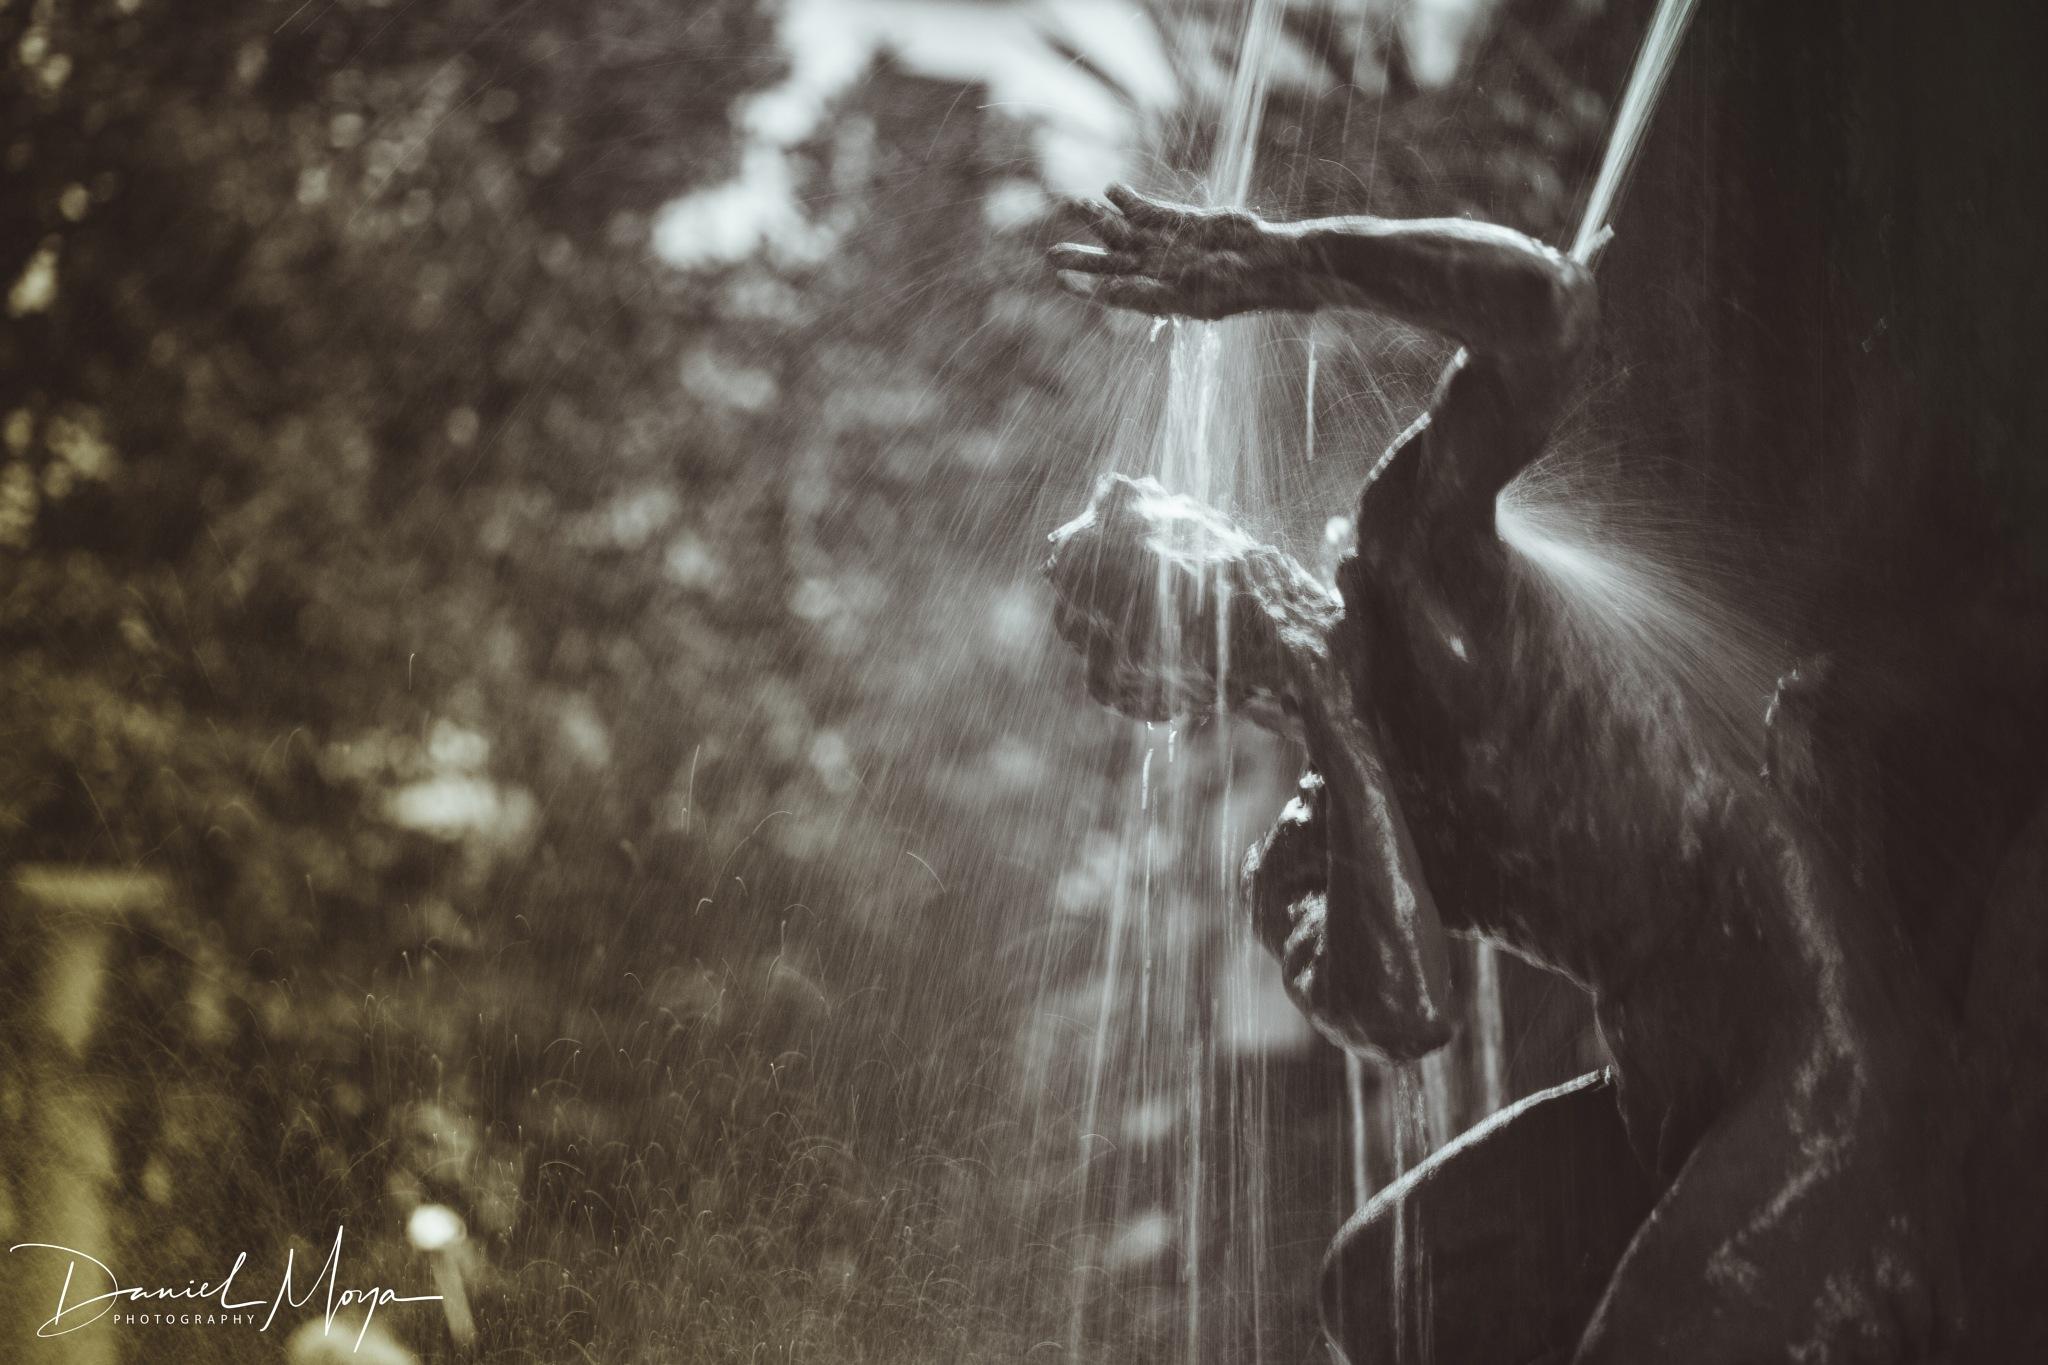 Washed my hand in muddi water  by DanielMoyaFuster